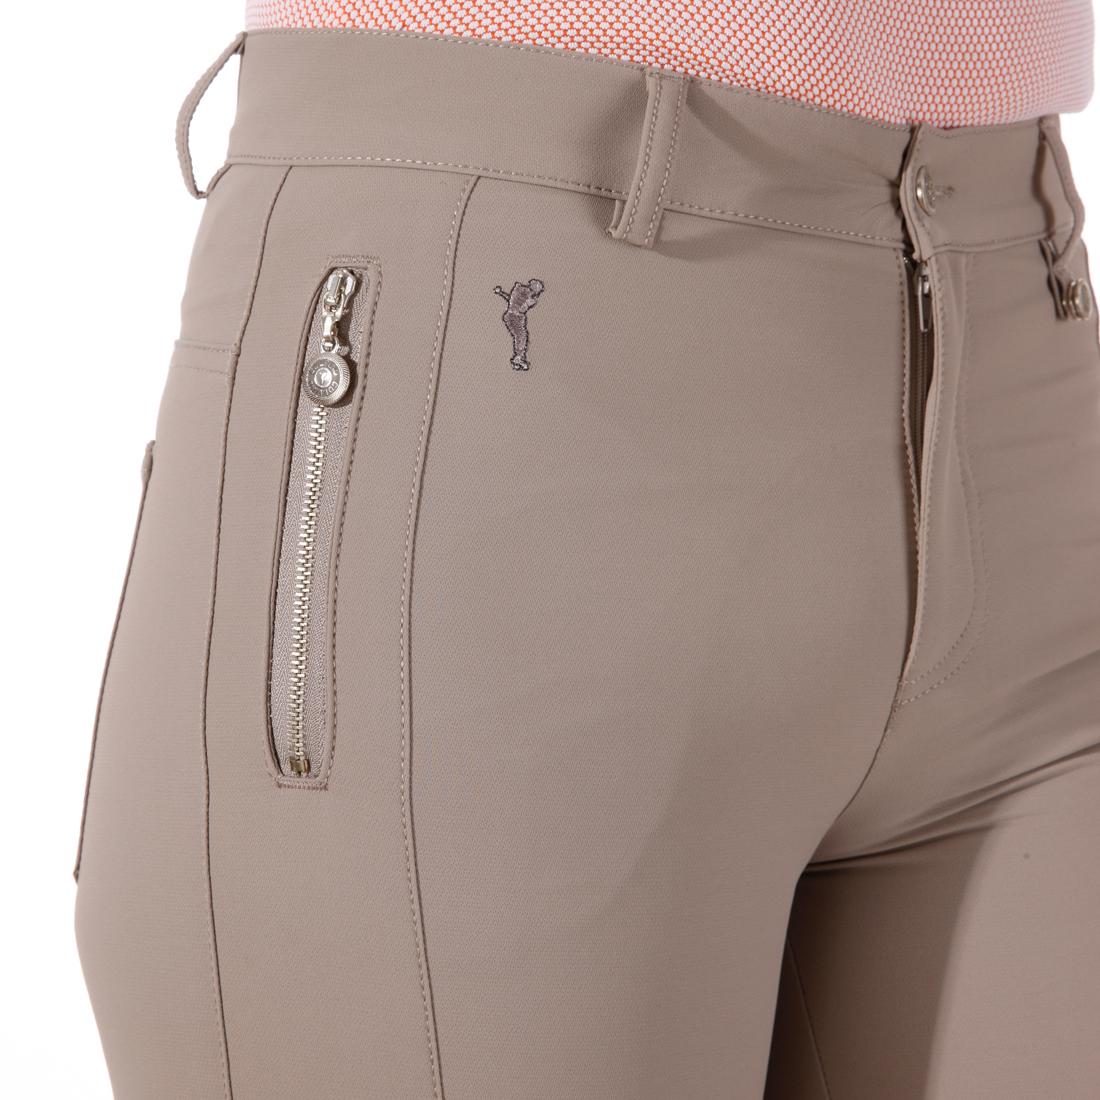 Damen Hose aus gebürstetem 4-Way-Stretchmaterial